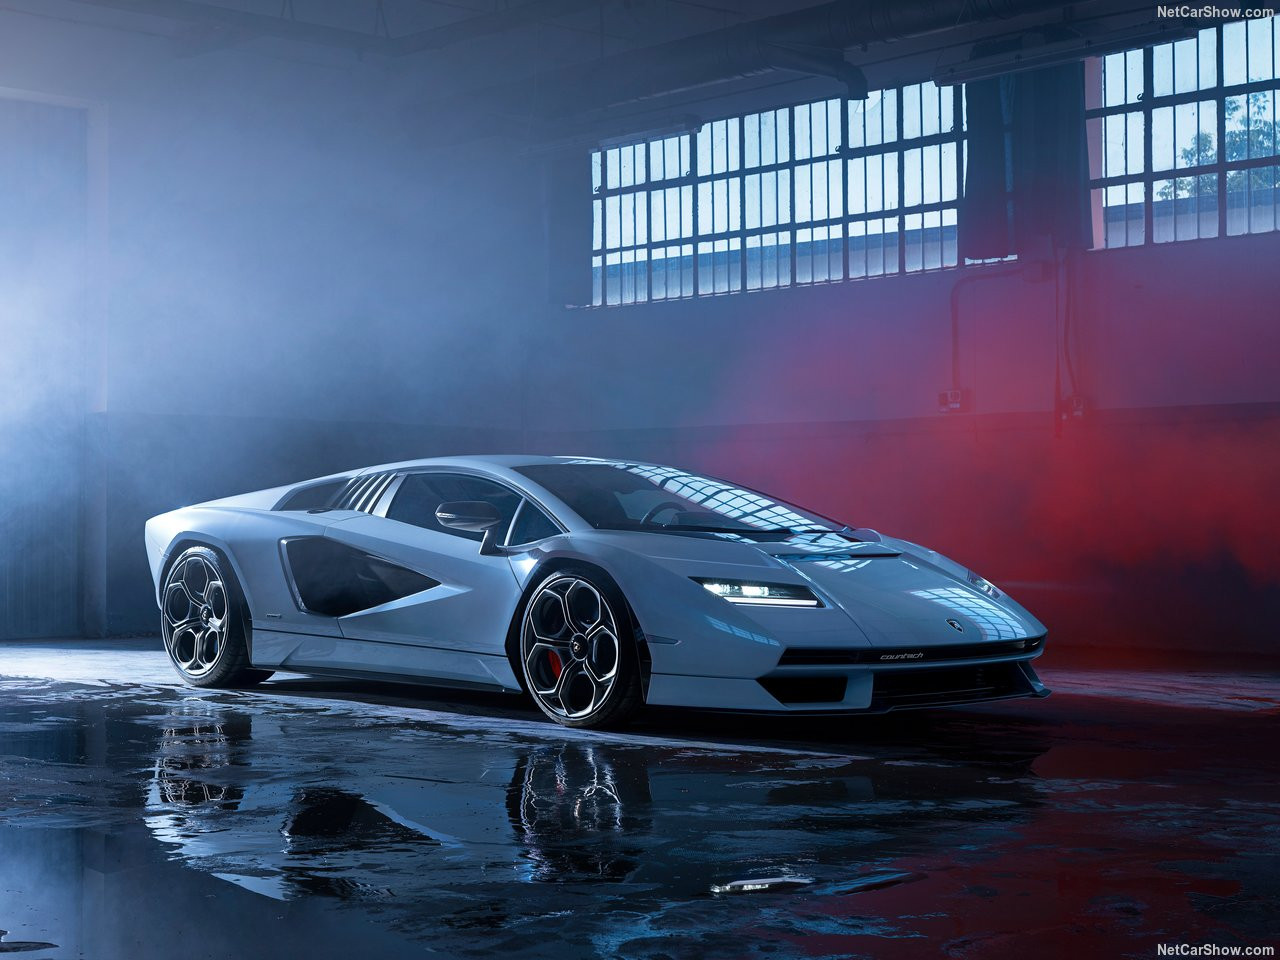 Lamborghini-Countach_LPI_800-4-2022-1280-02.jpg